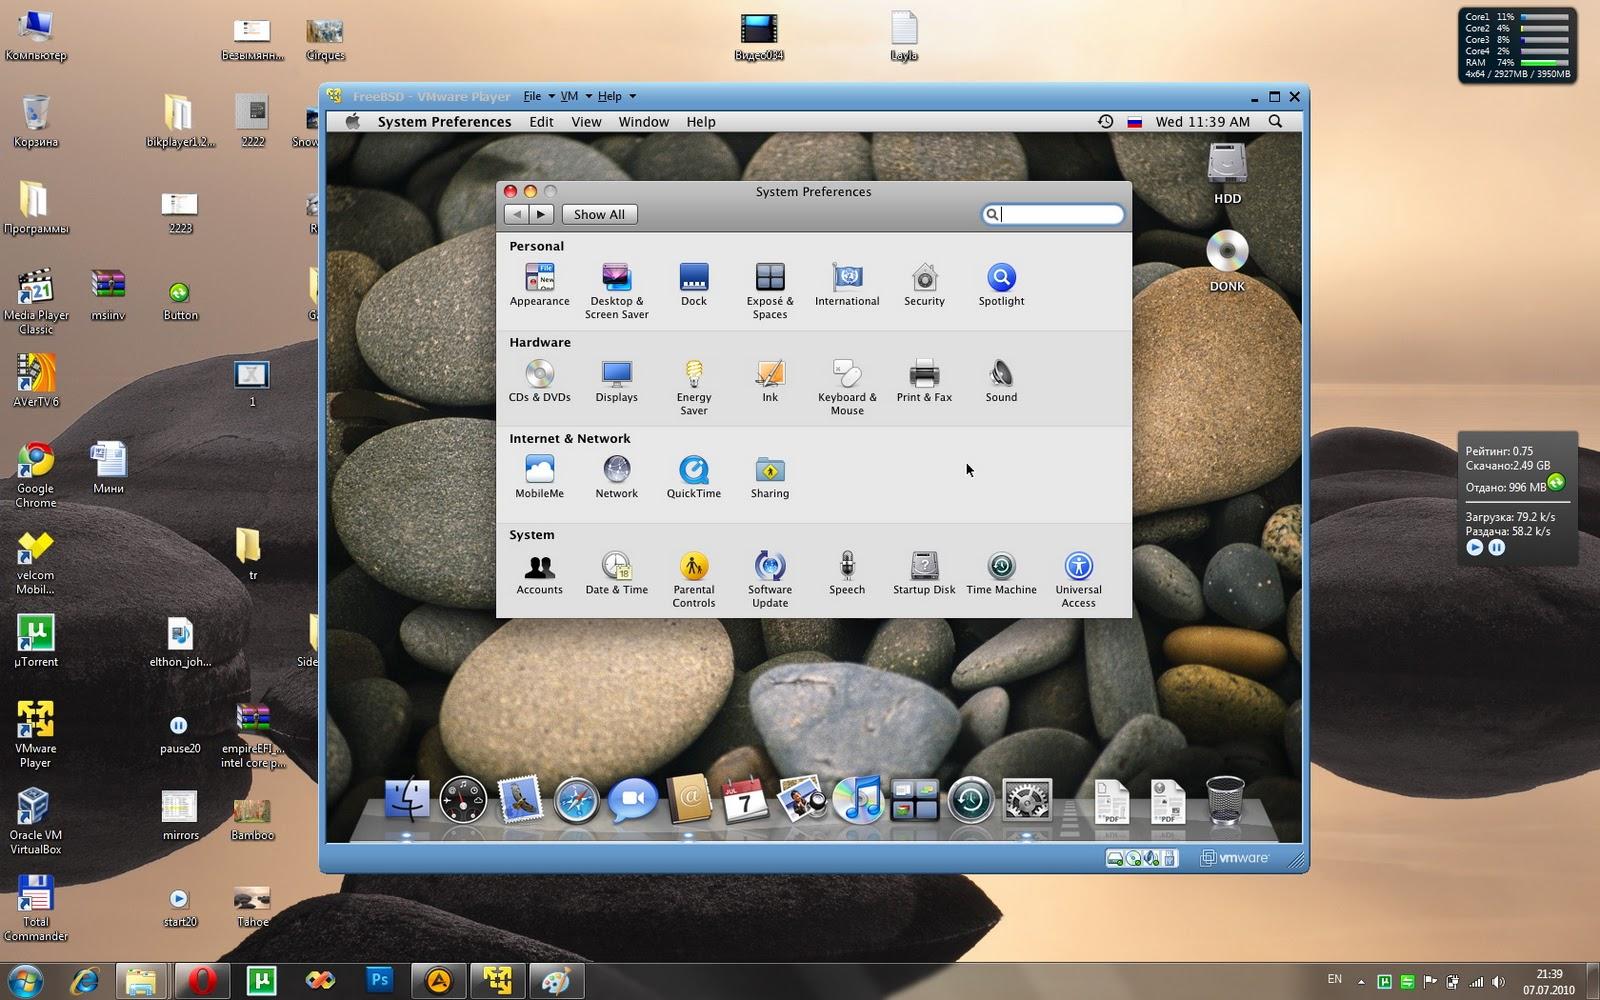 Установка Mac OS X Leopard на виртуальную машину VmWare Блог IT'шника